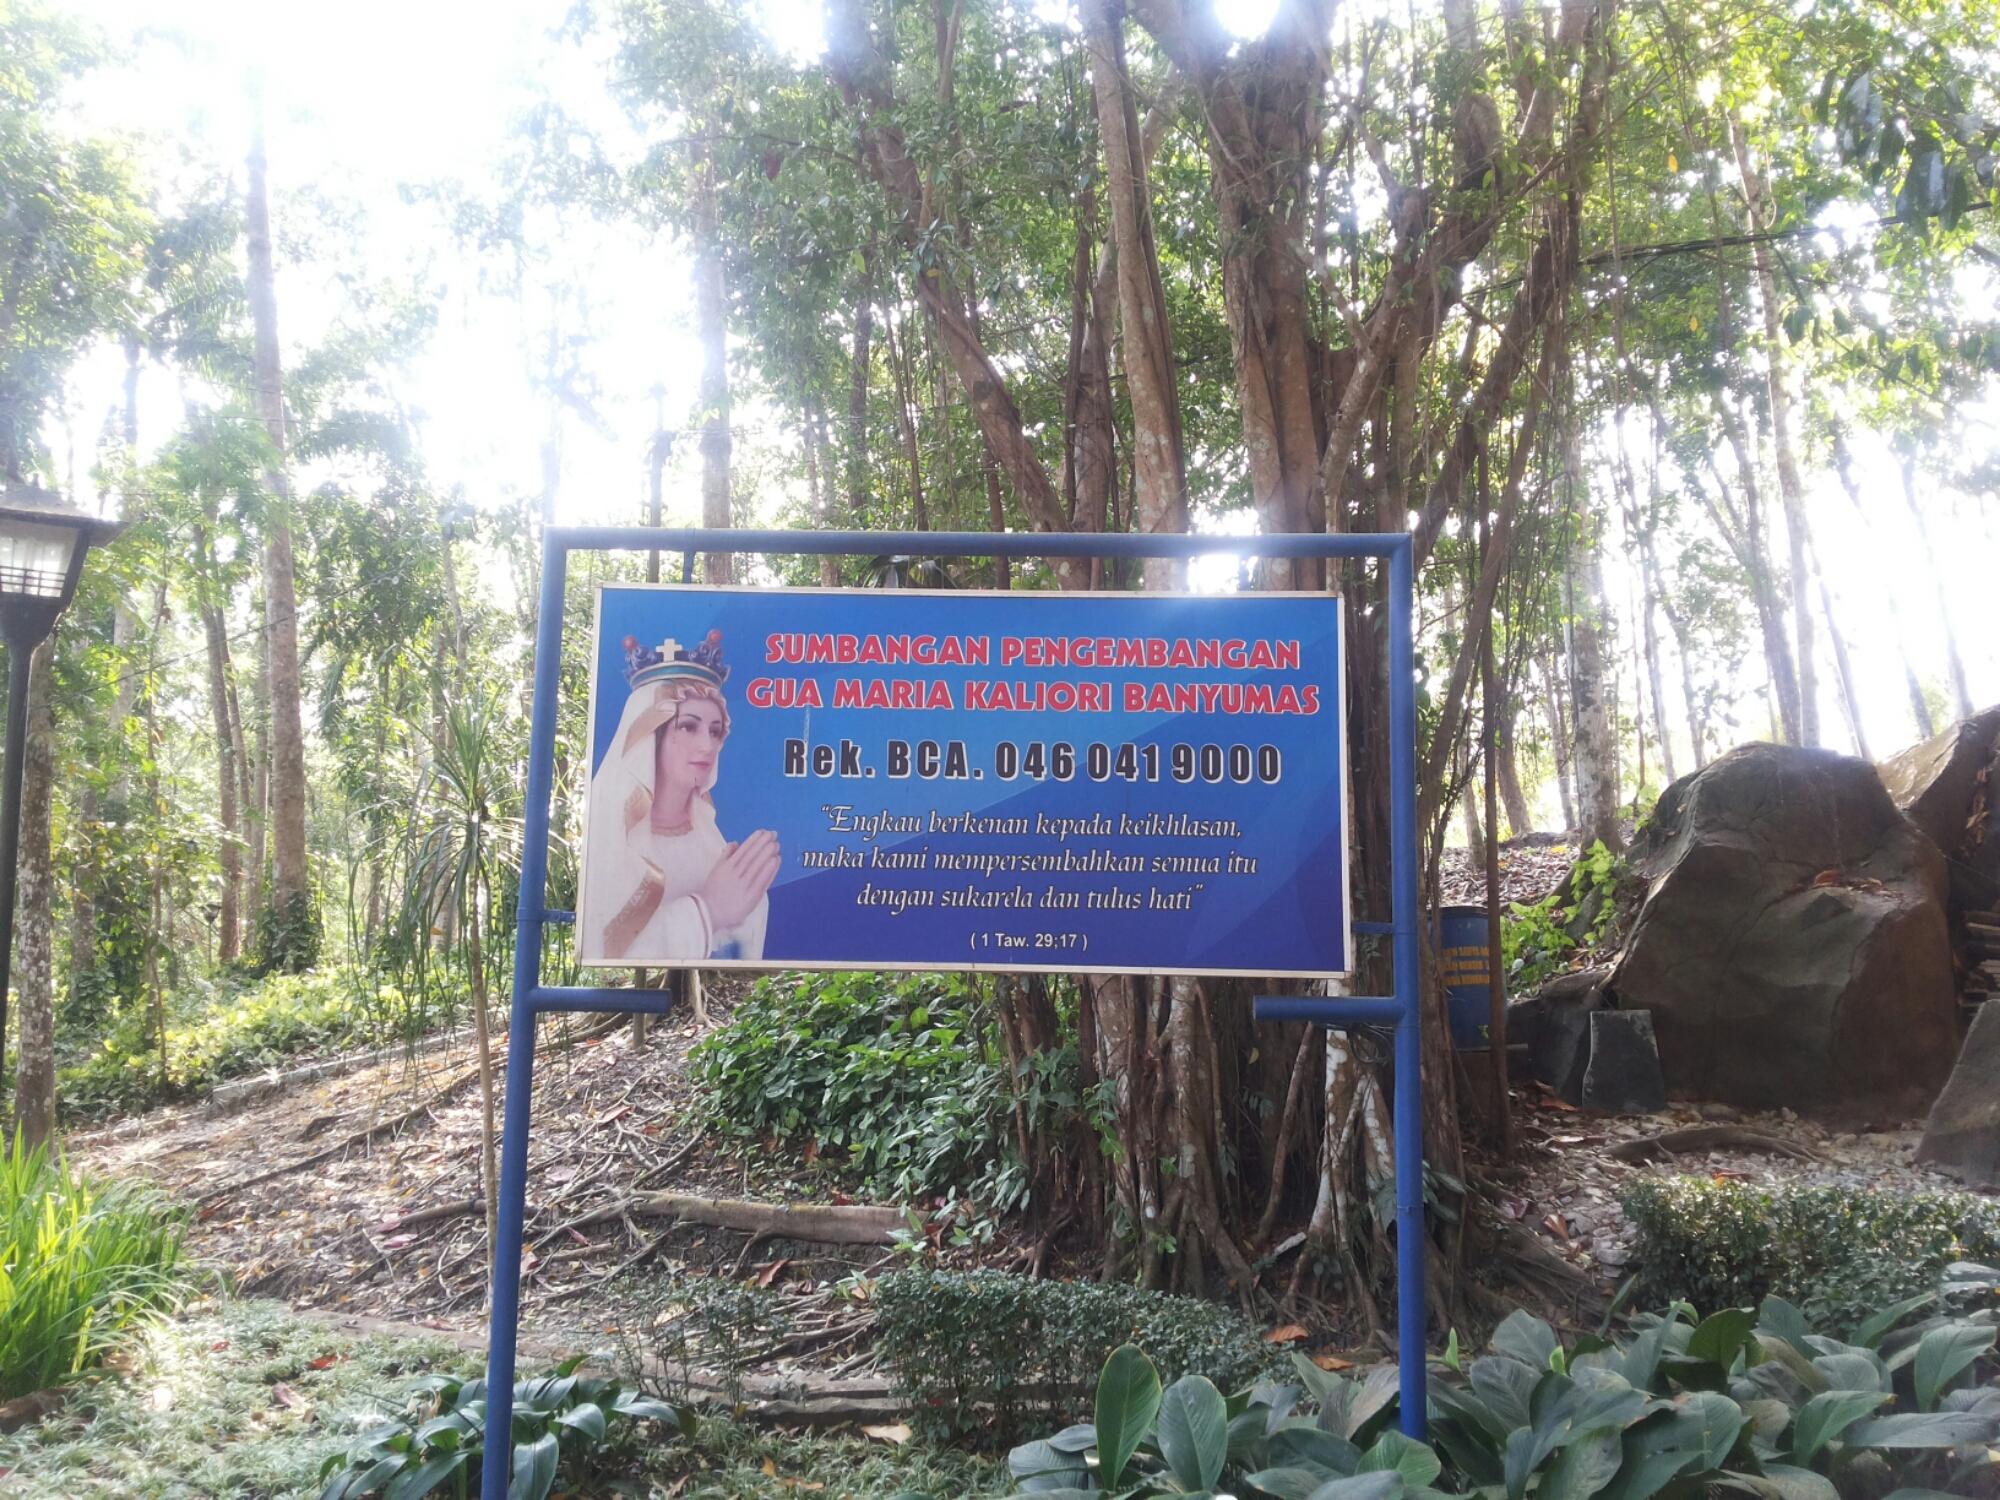 Menuju Gua Maria Kaliori Banyumas Anak Surakarta Solo Image Goa